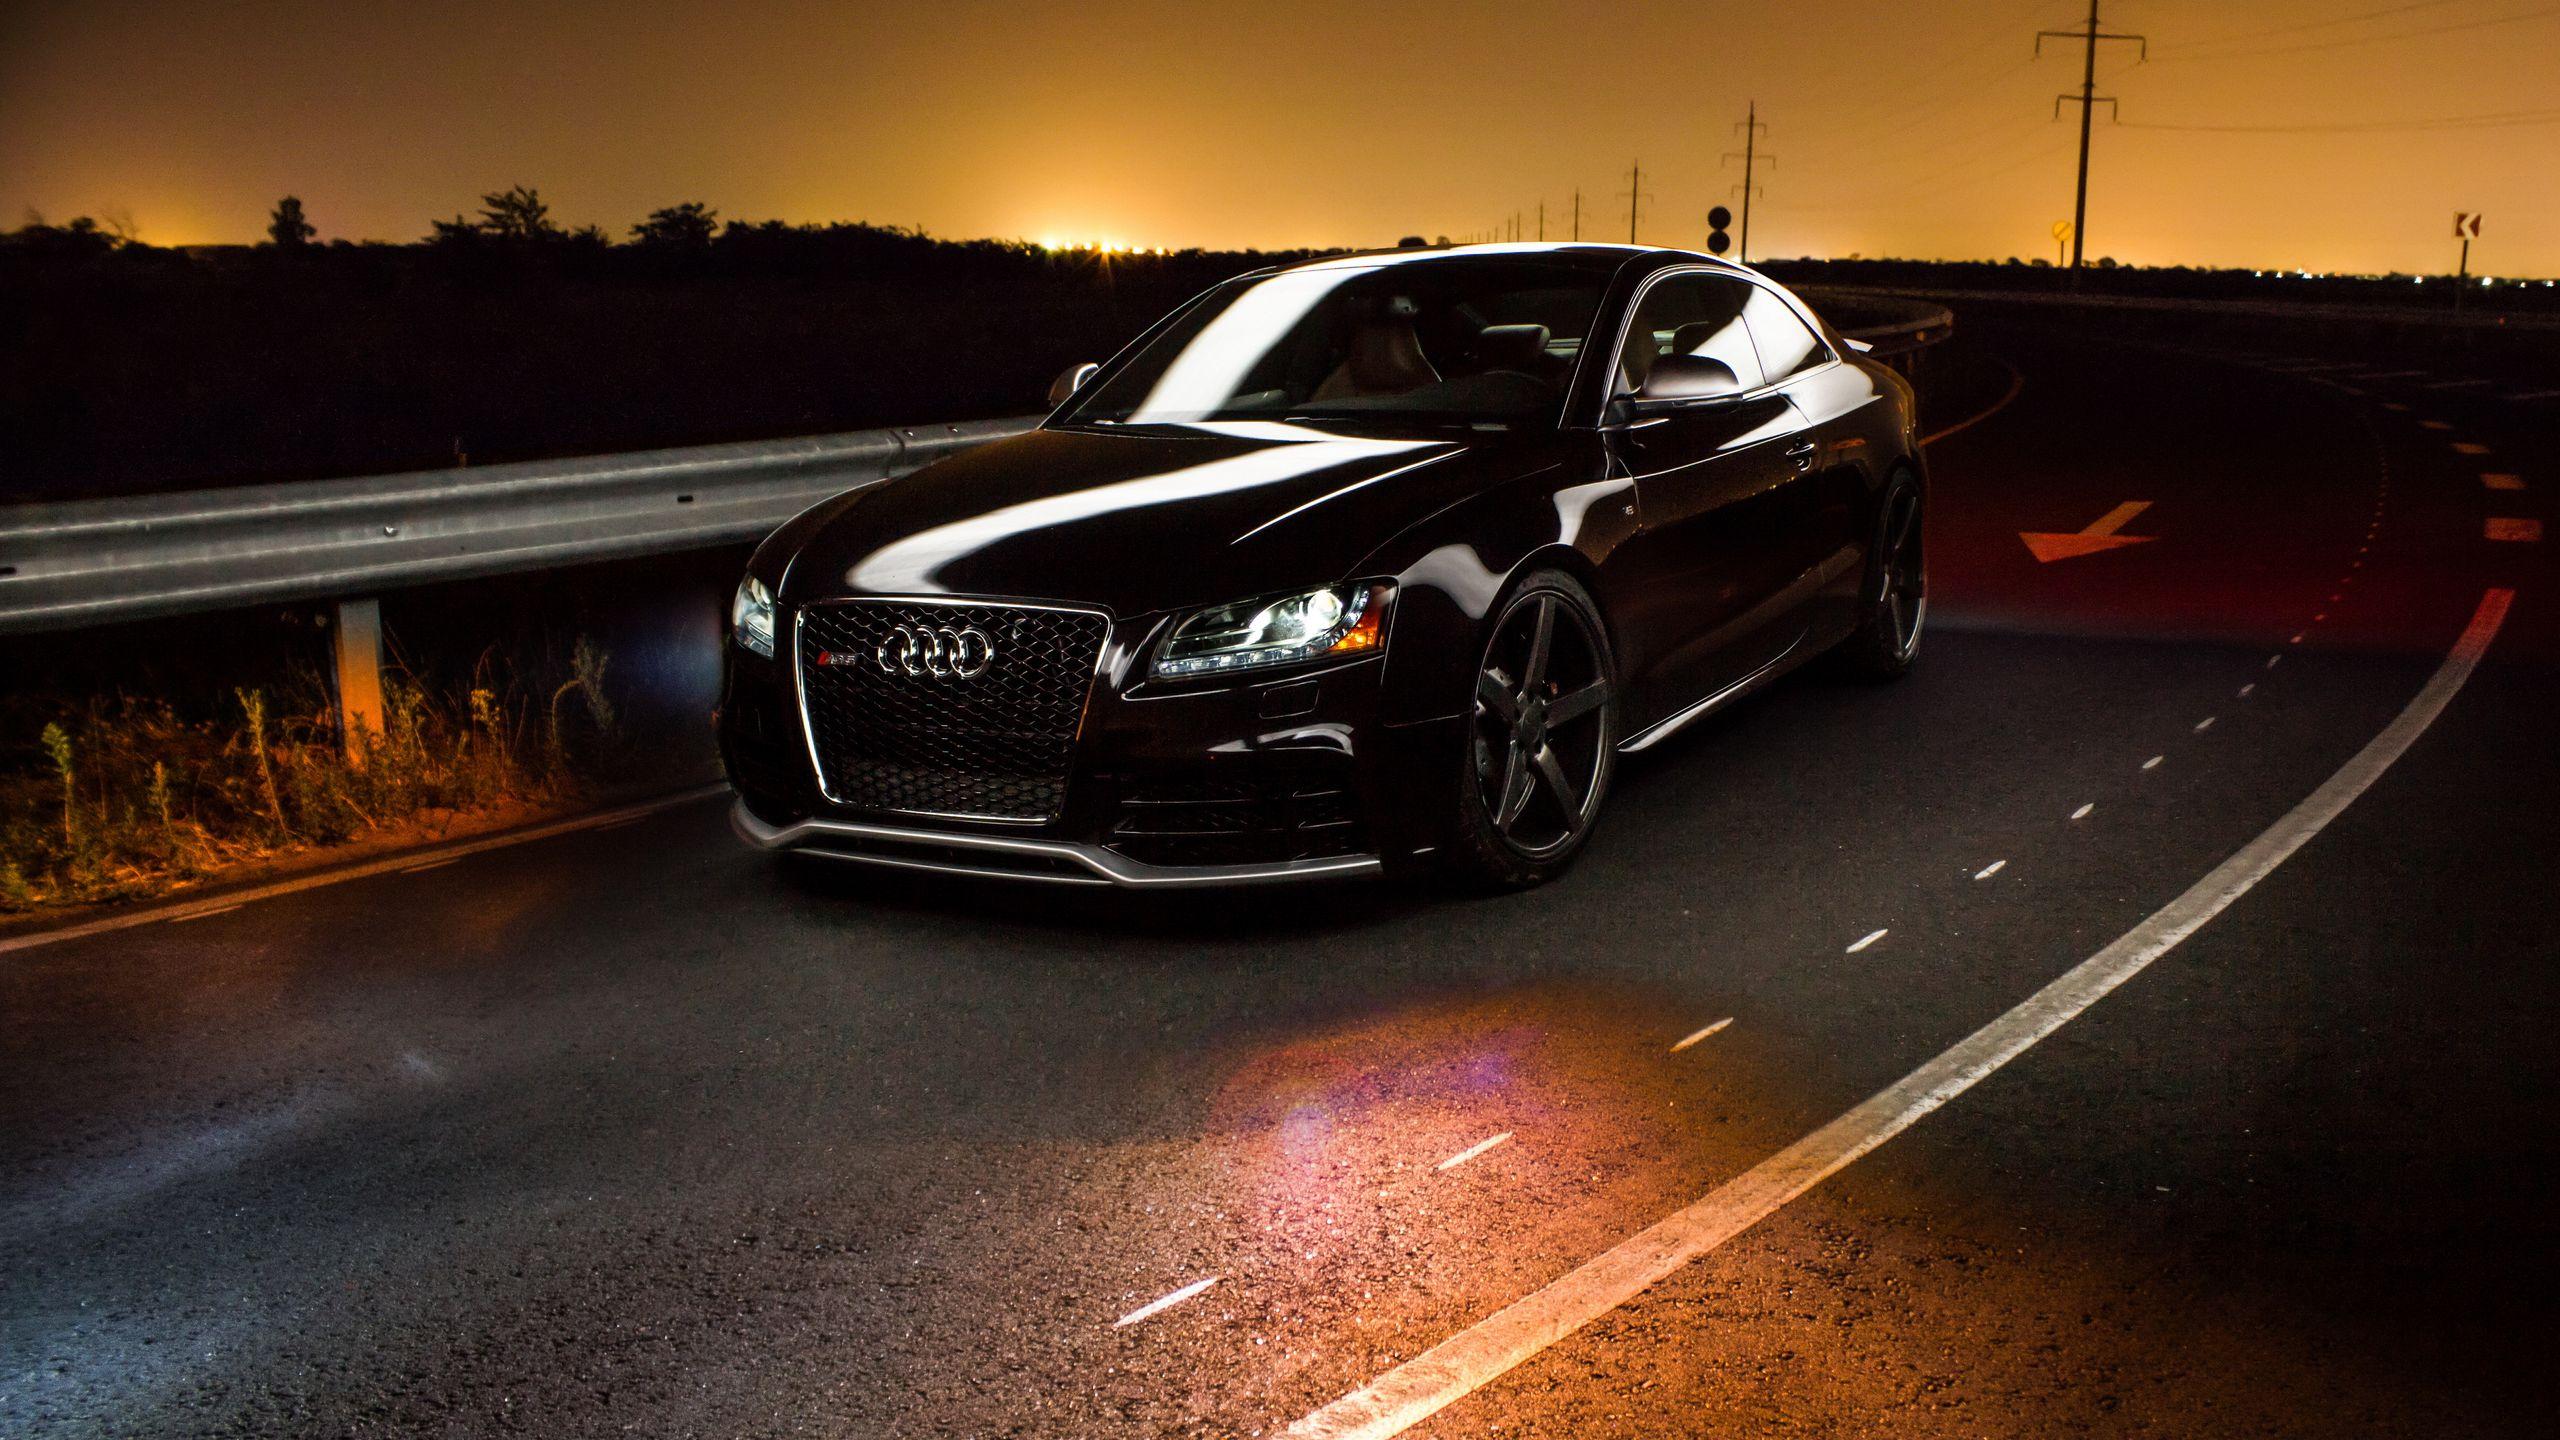 Audi Rs5 Noir Wallpaper Hd Fond Décran Hd